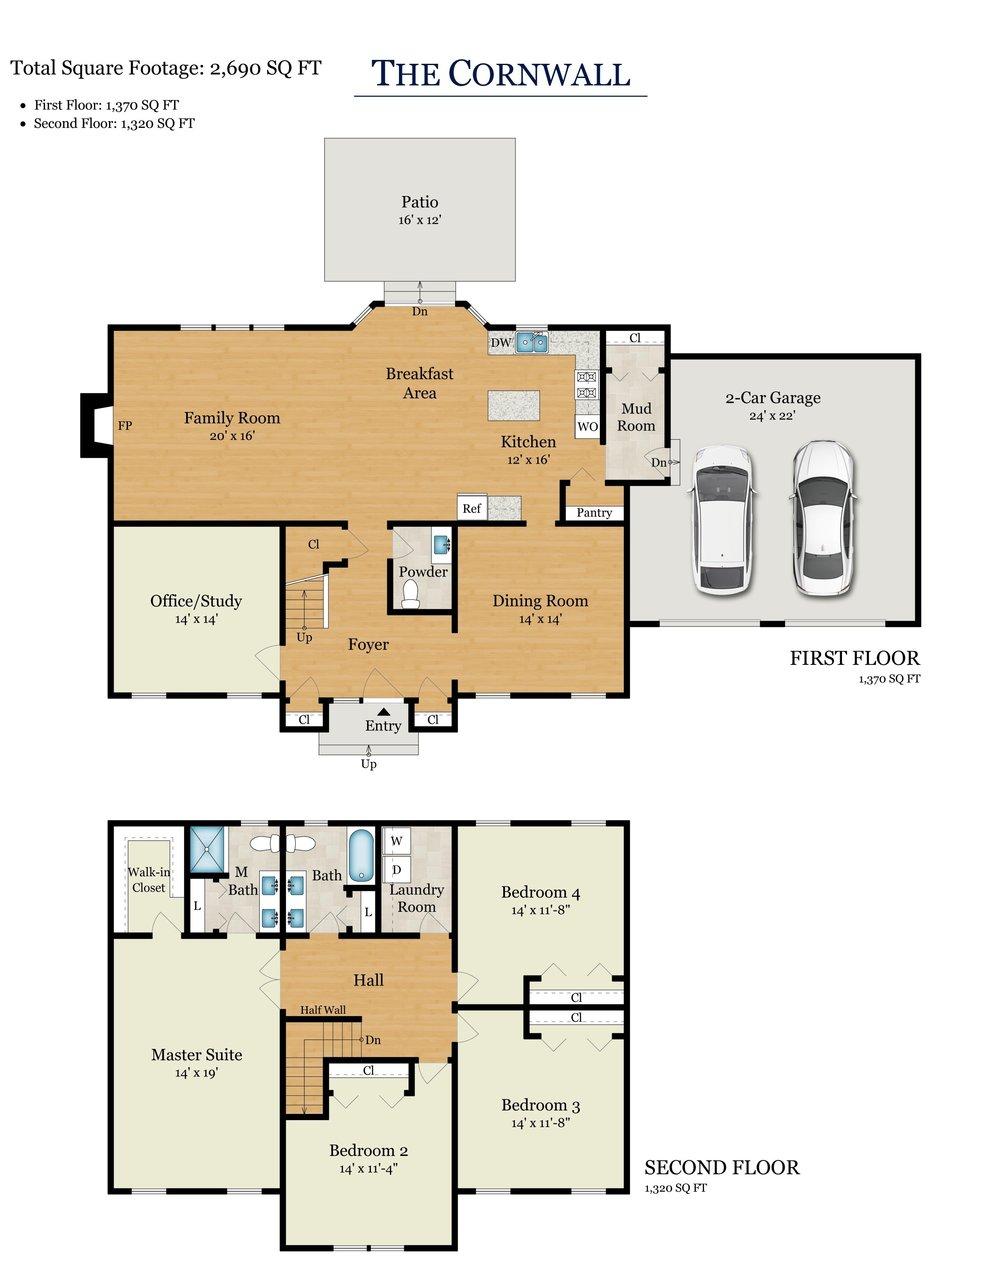 CFP-TheCornwall-FloorPlan-Print-R2.jpg